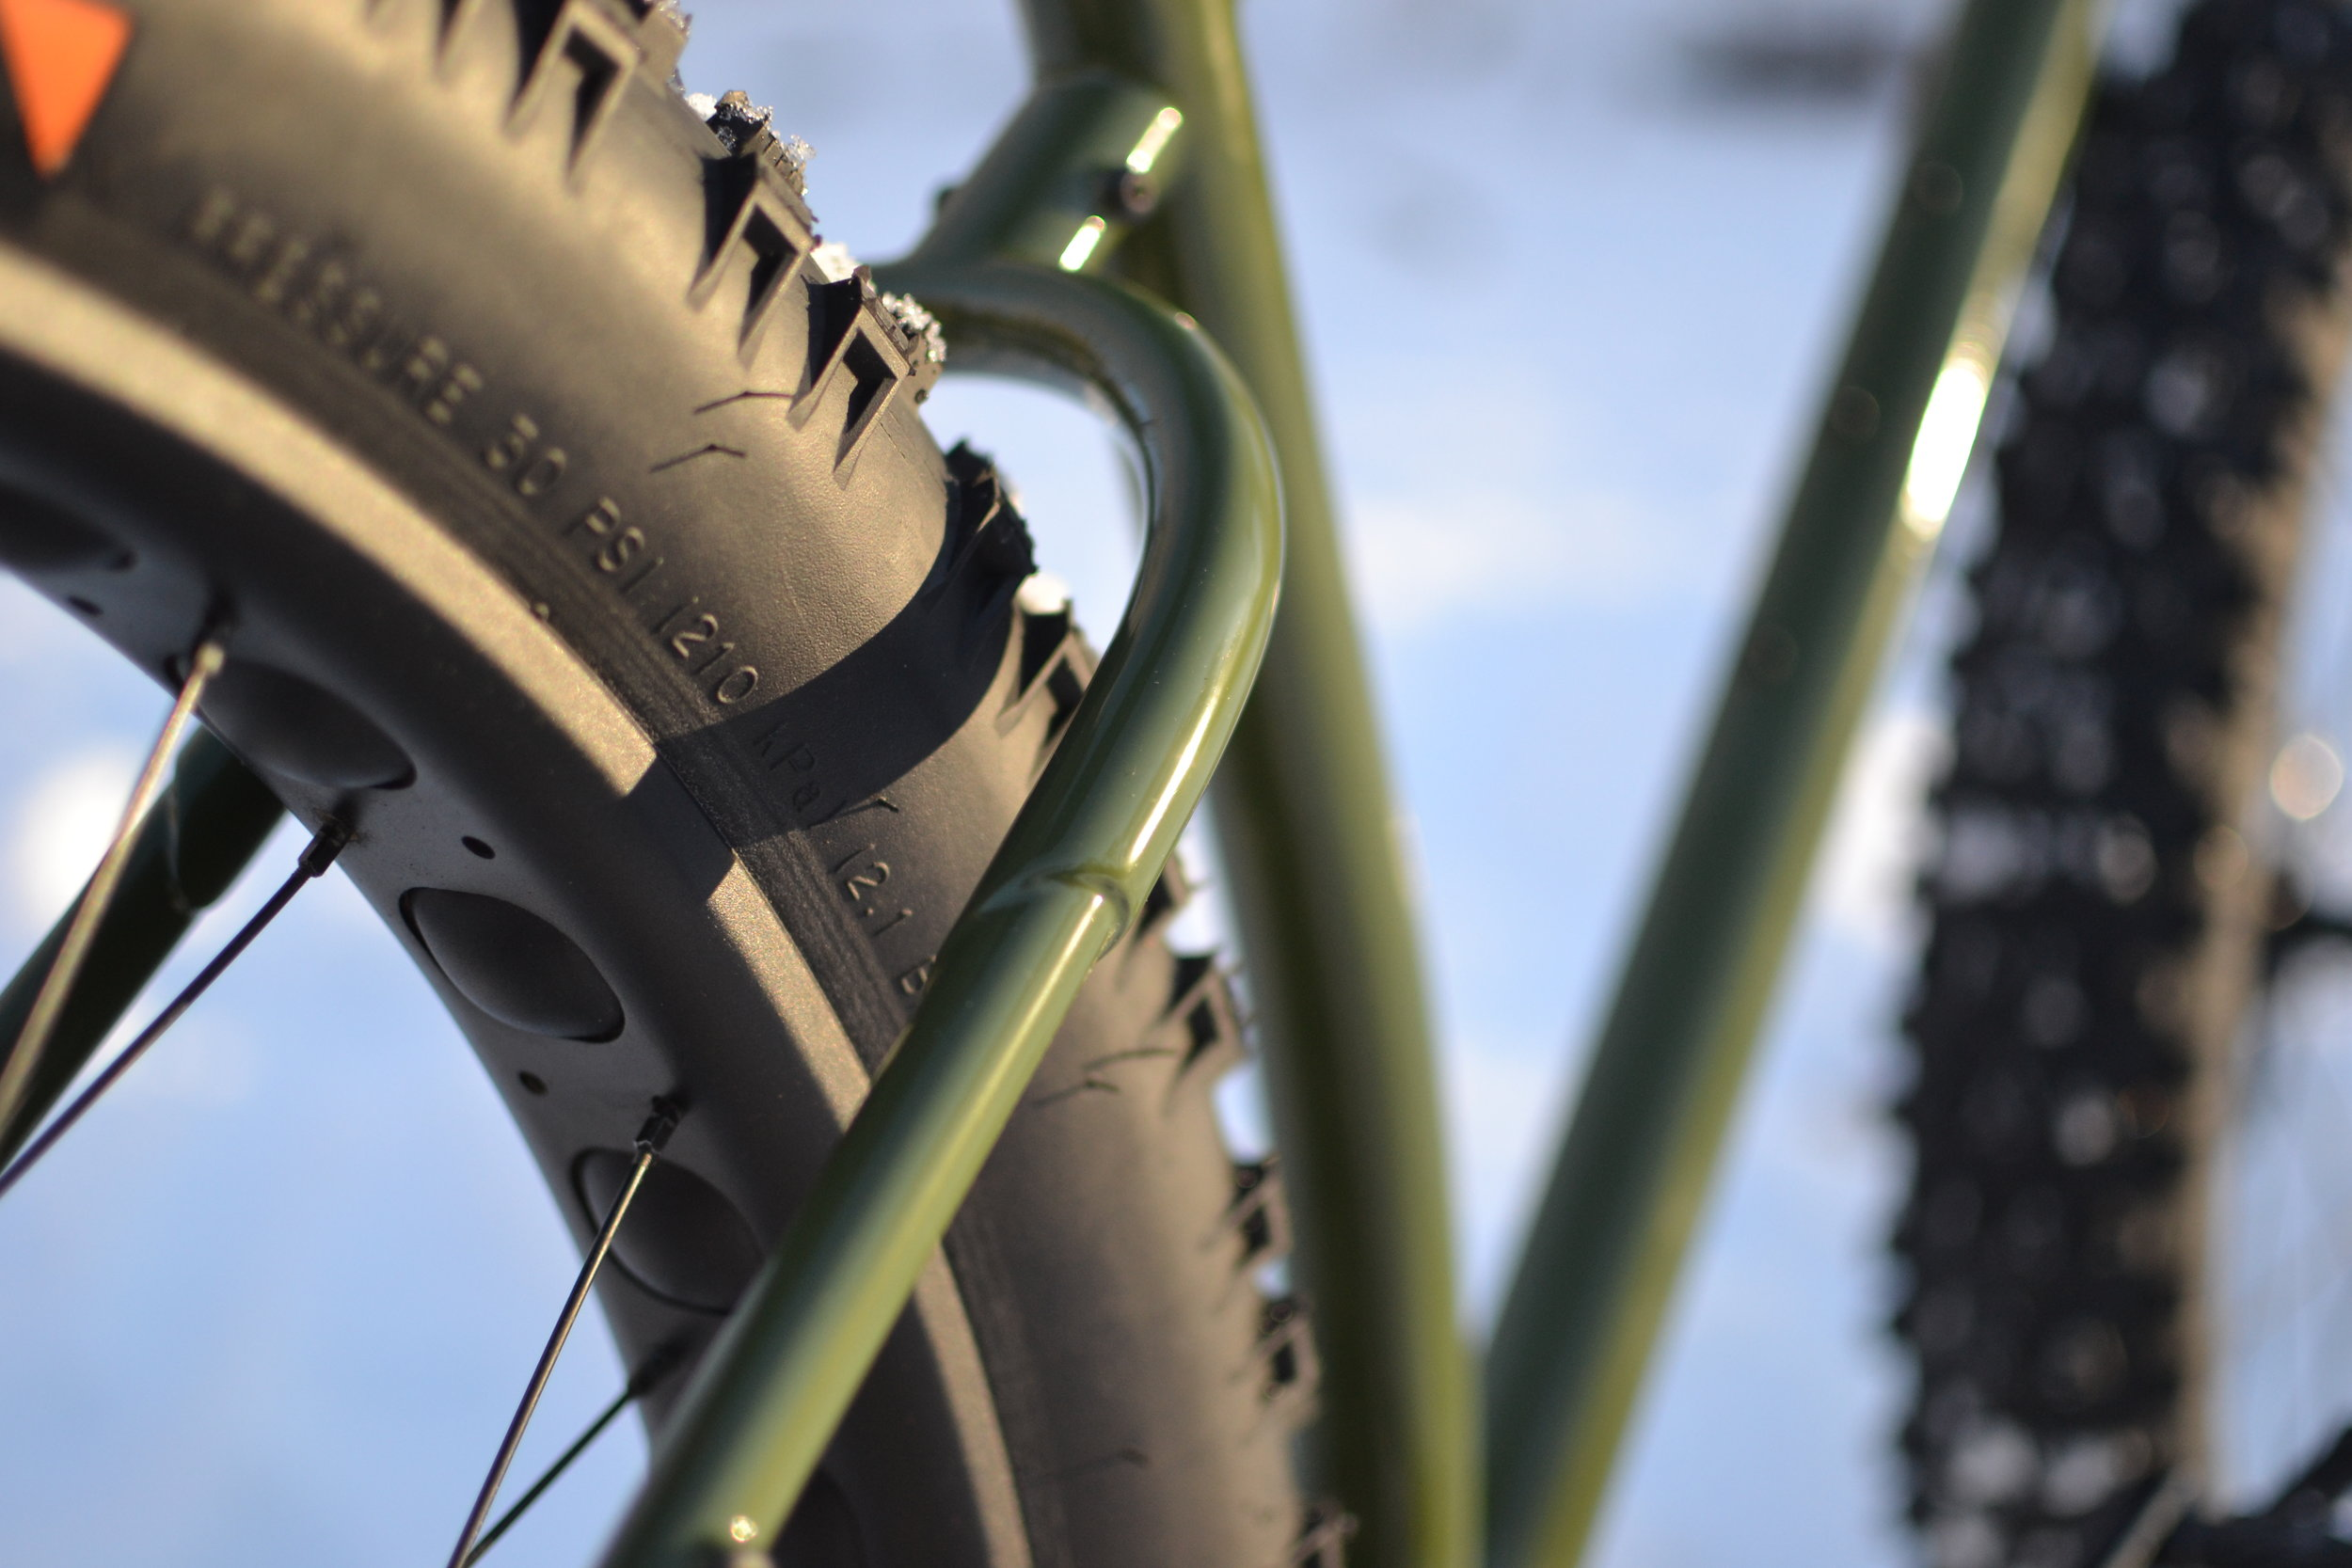 Custom steel fat bike handbuilt